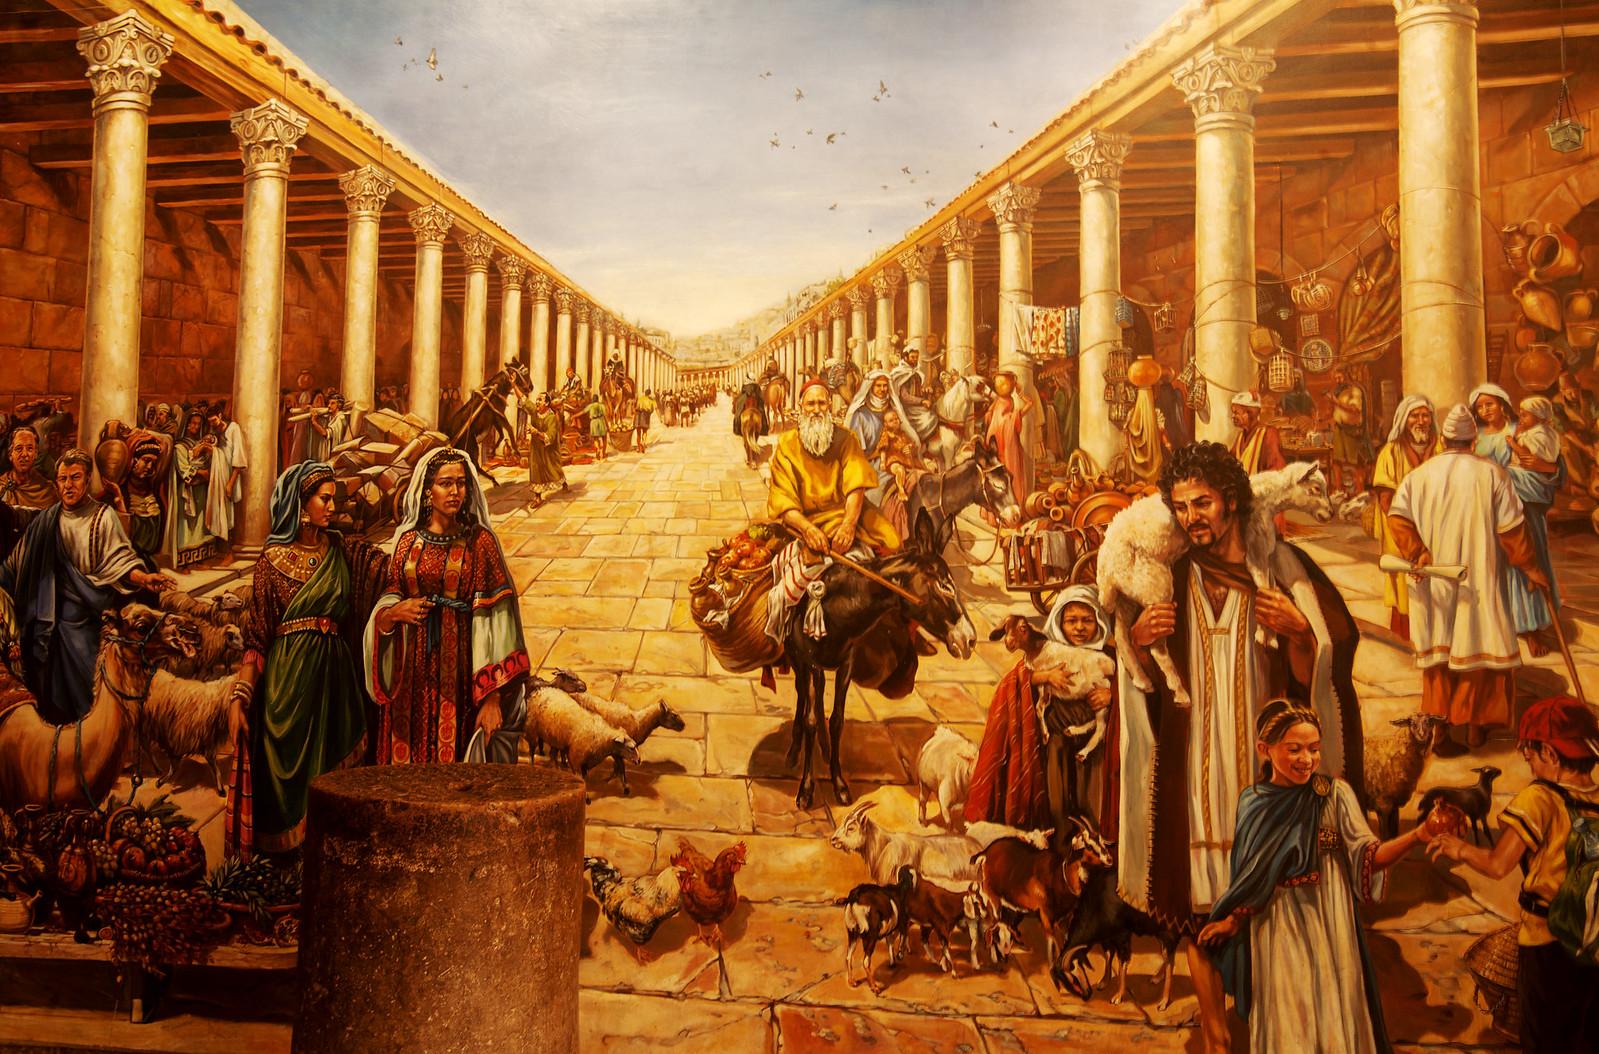 Jerusalem Cardo Painting_Noam Chen_IMOT